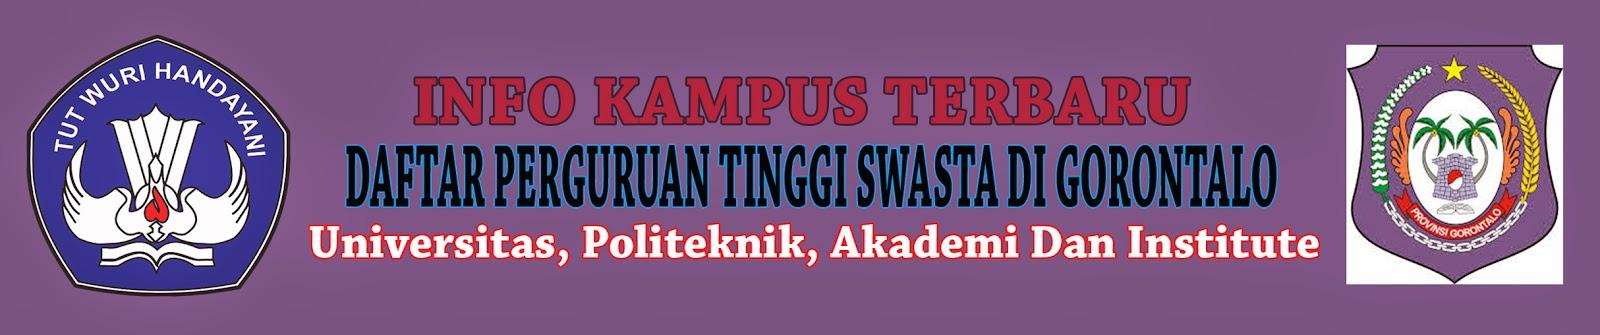 Daftar Perguruan Tinggi Swasta Di Gorontalo